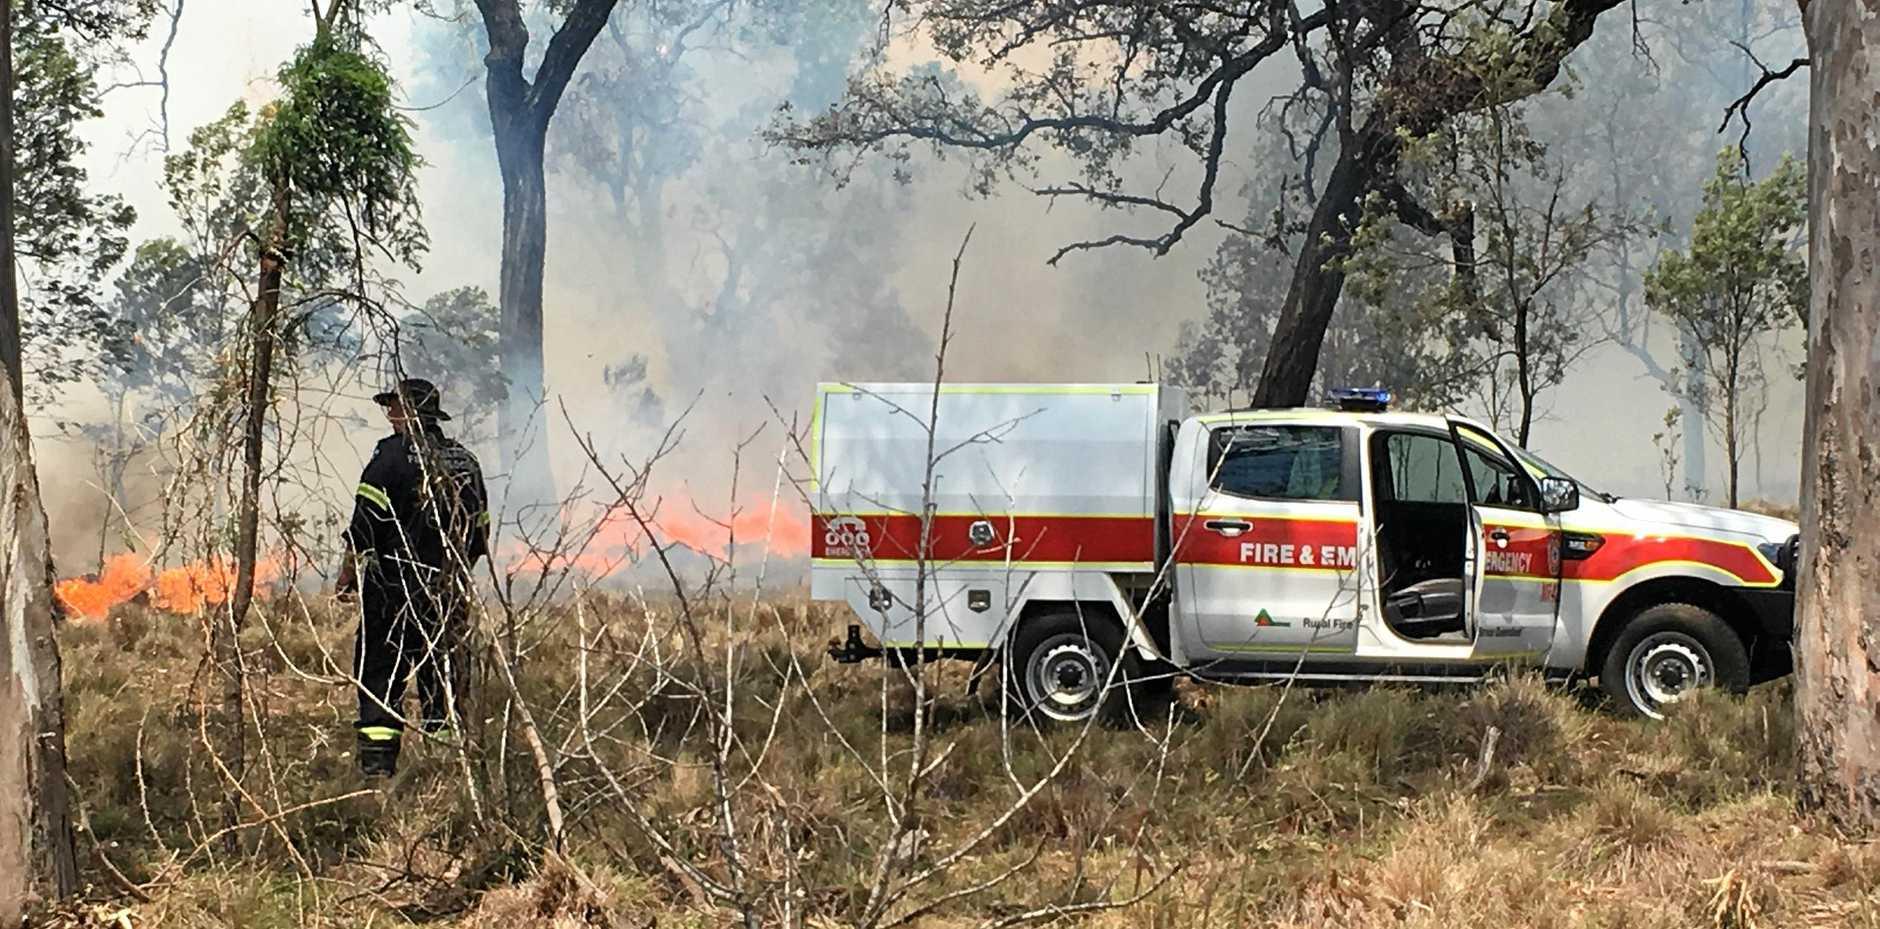 Crews fight a grass fire at Memerambi on November 28, 2018.